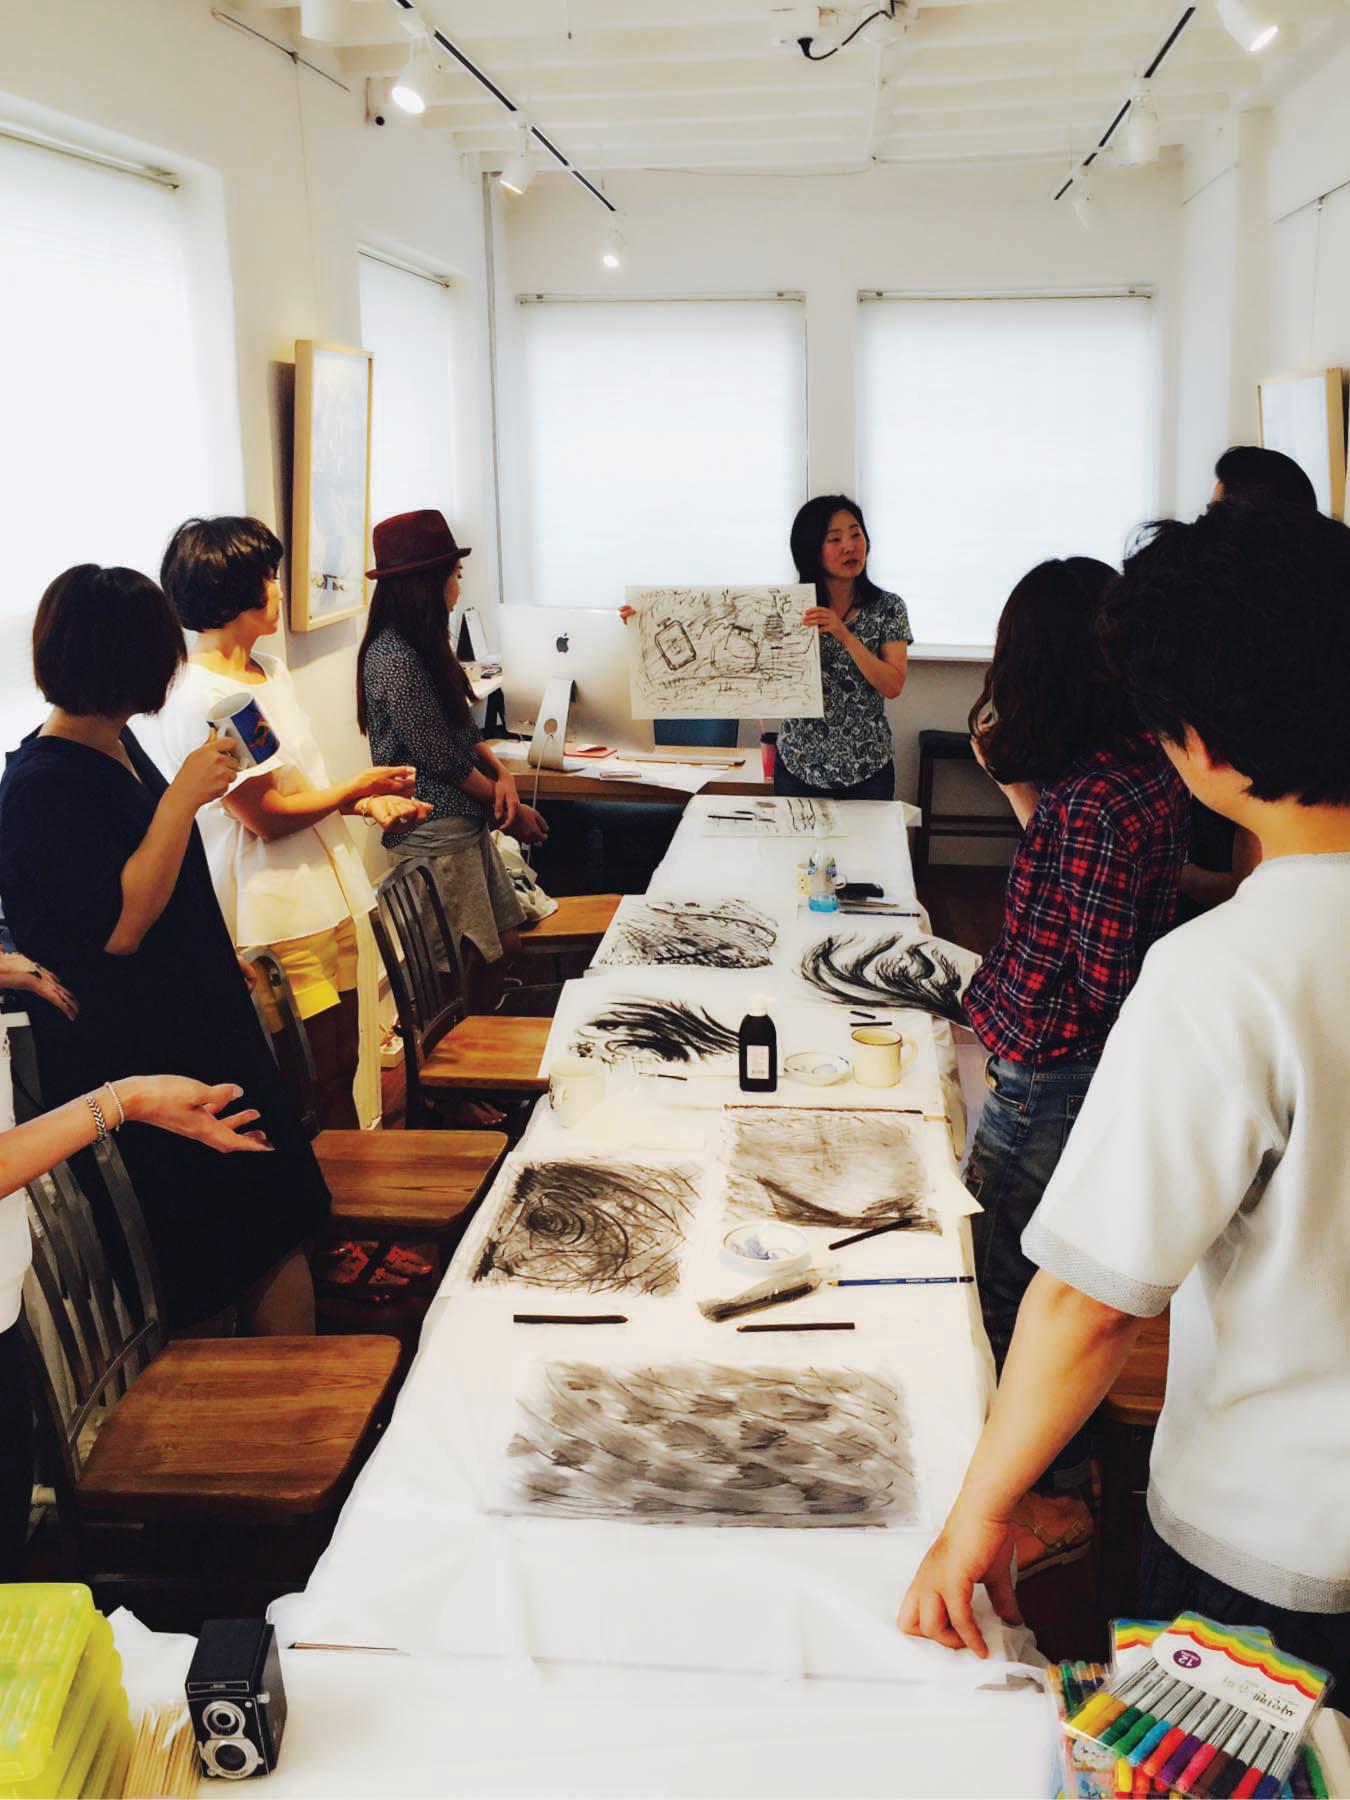 Art Class with the artist